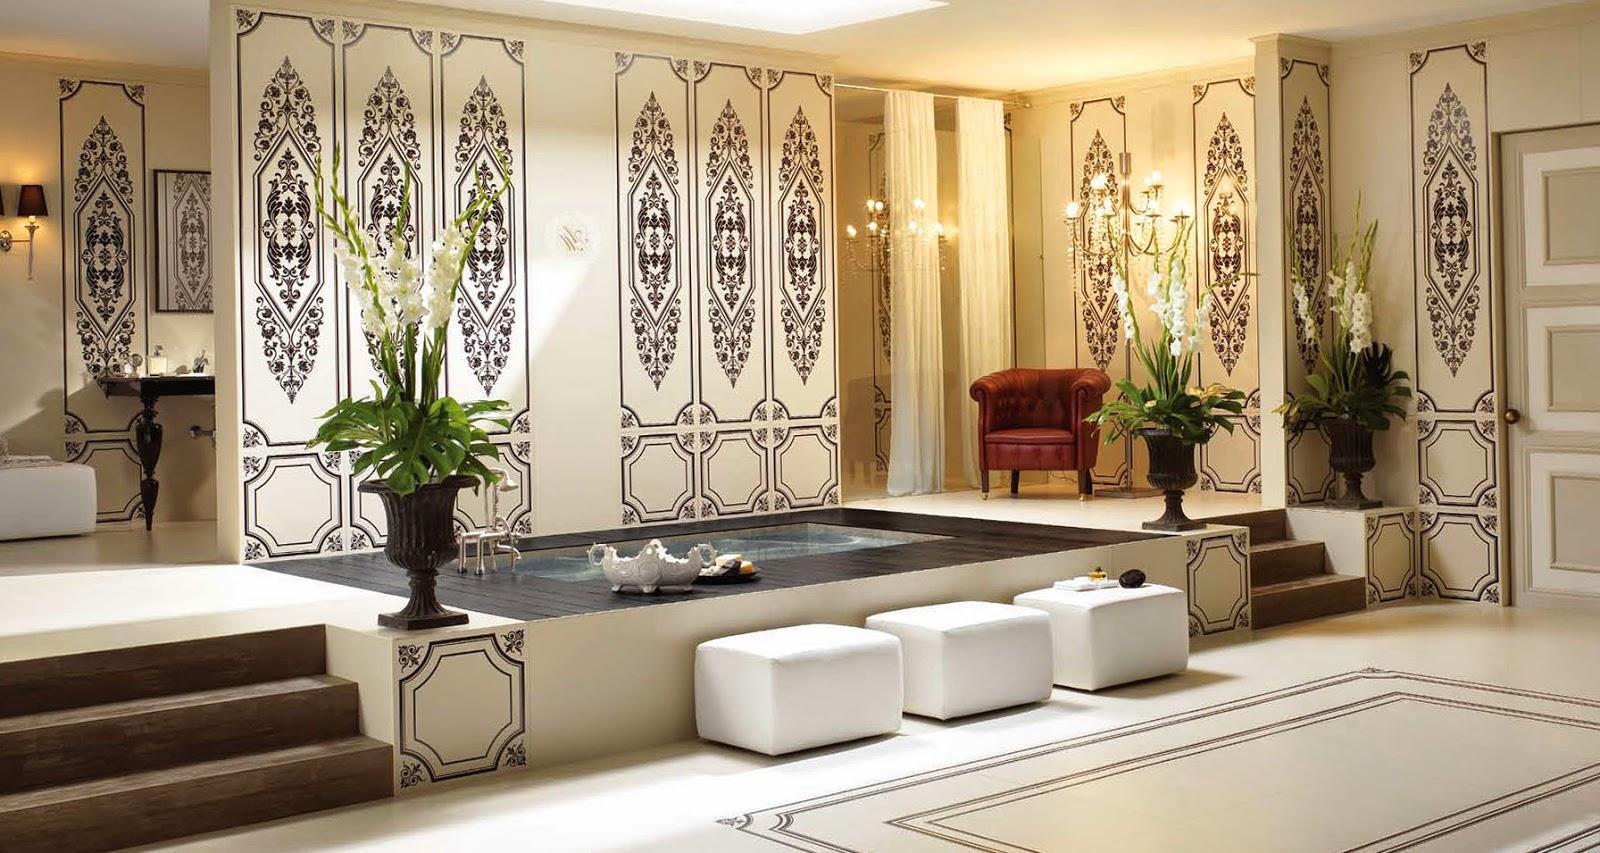 Annaline interior design p ytki ceramiczne moda i trendy w 2014 - Decoration orientale moderne ...